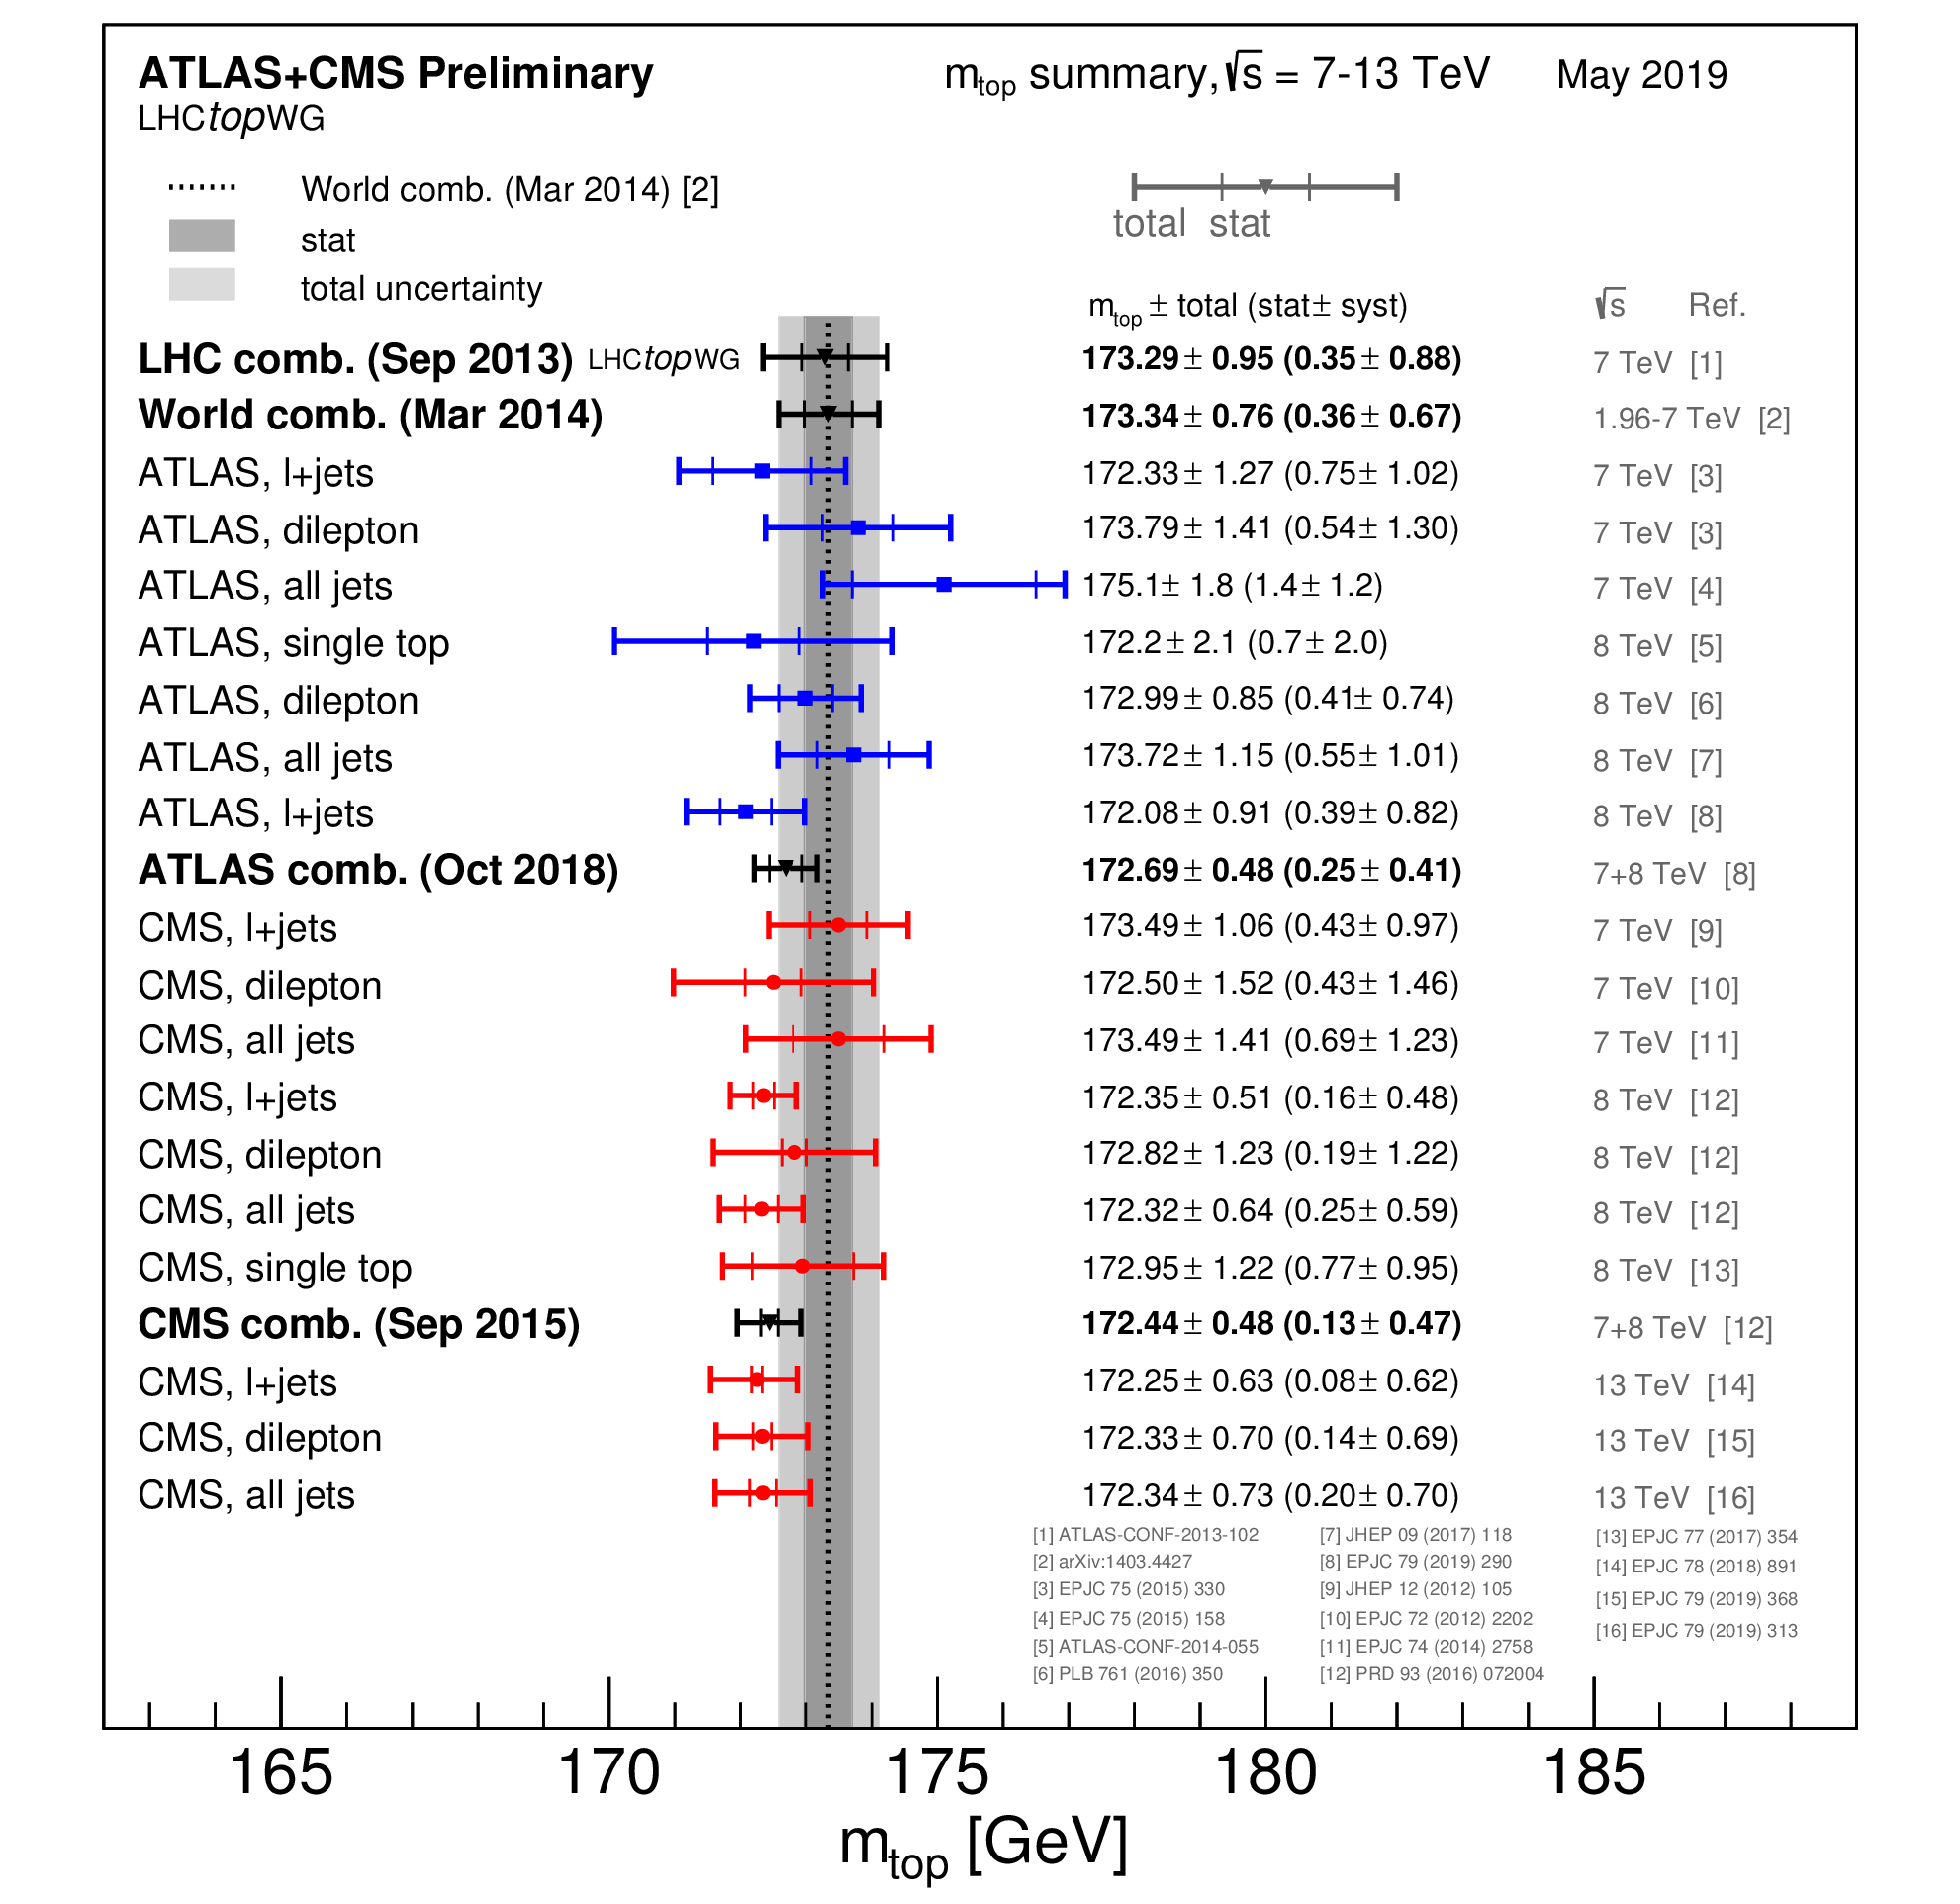 https://atlas.web.cern.ch/Atlas/GROUPS/PHYSICS/CombinedSummaryPlots/TOP/mtopSummary_TopLHC/mtopSummary_TopLHC.png